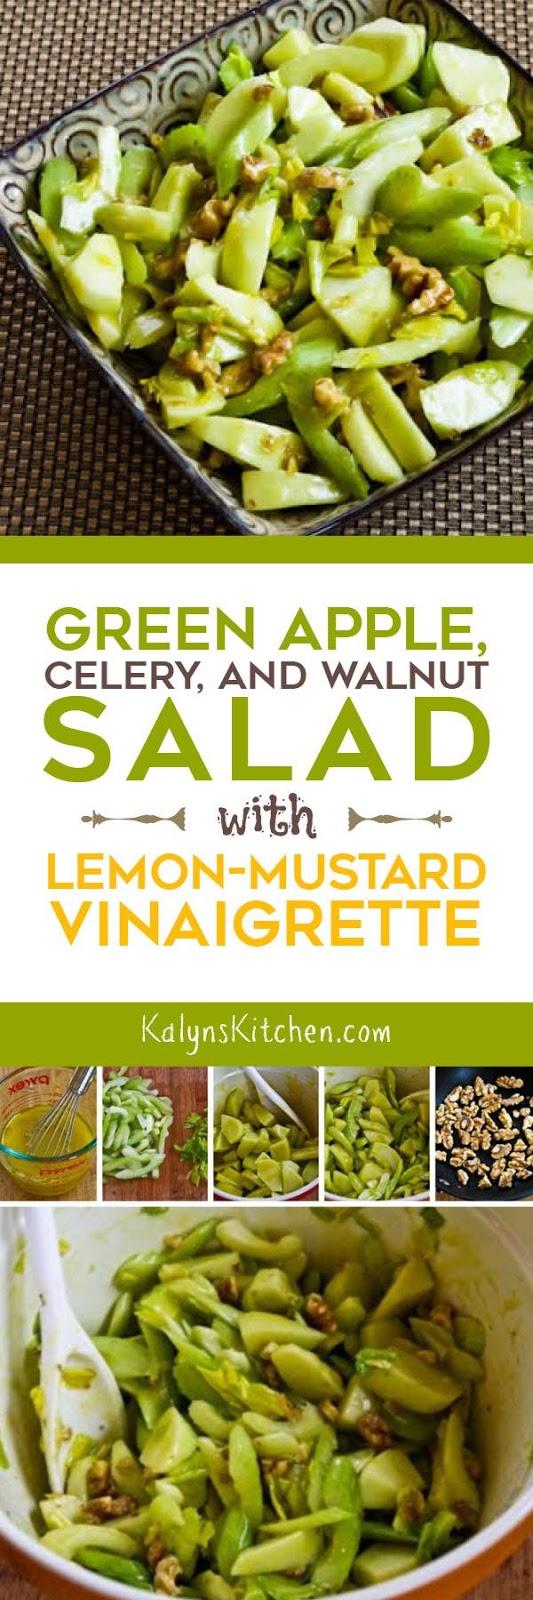 Green Apple, Celery, and Walnut Salad with Lemon-Mustard ...